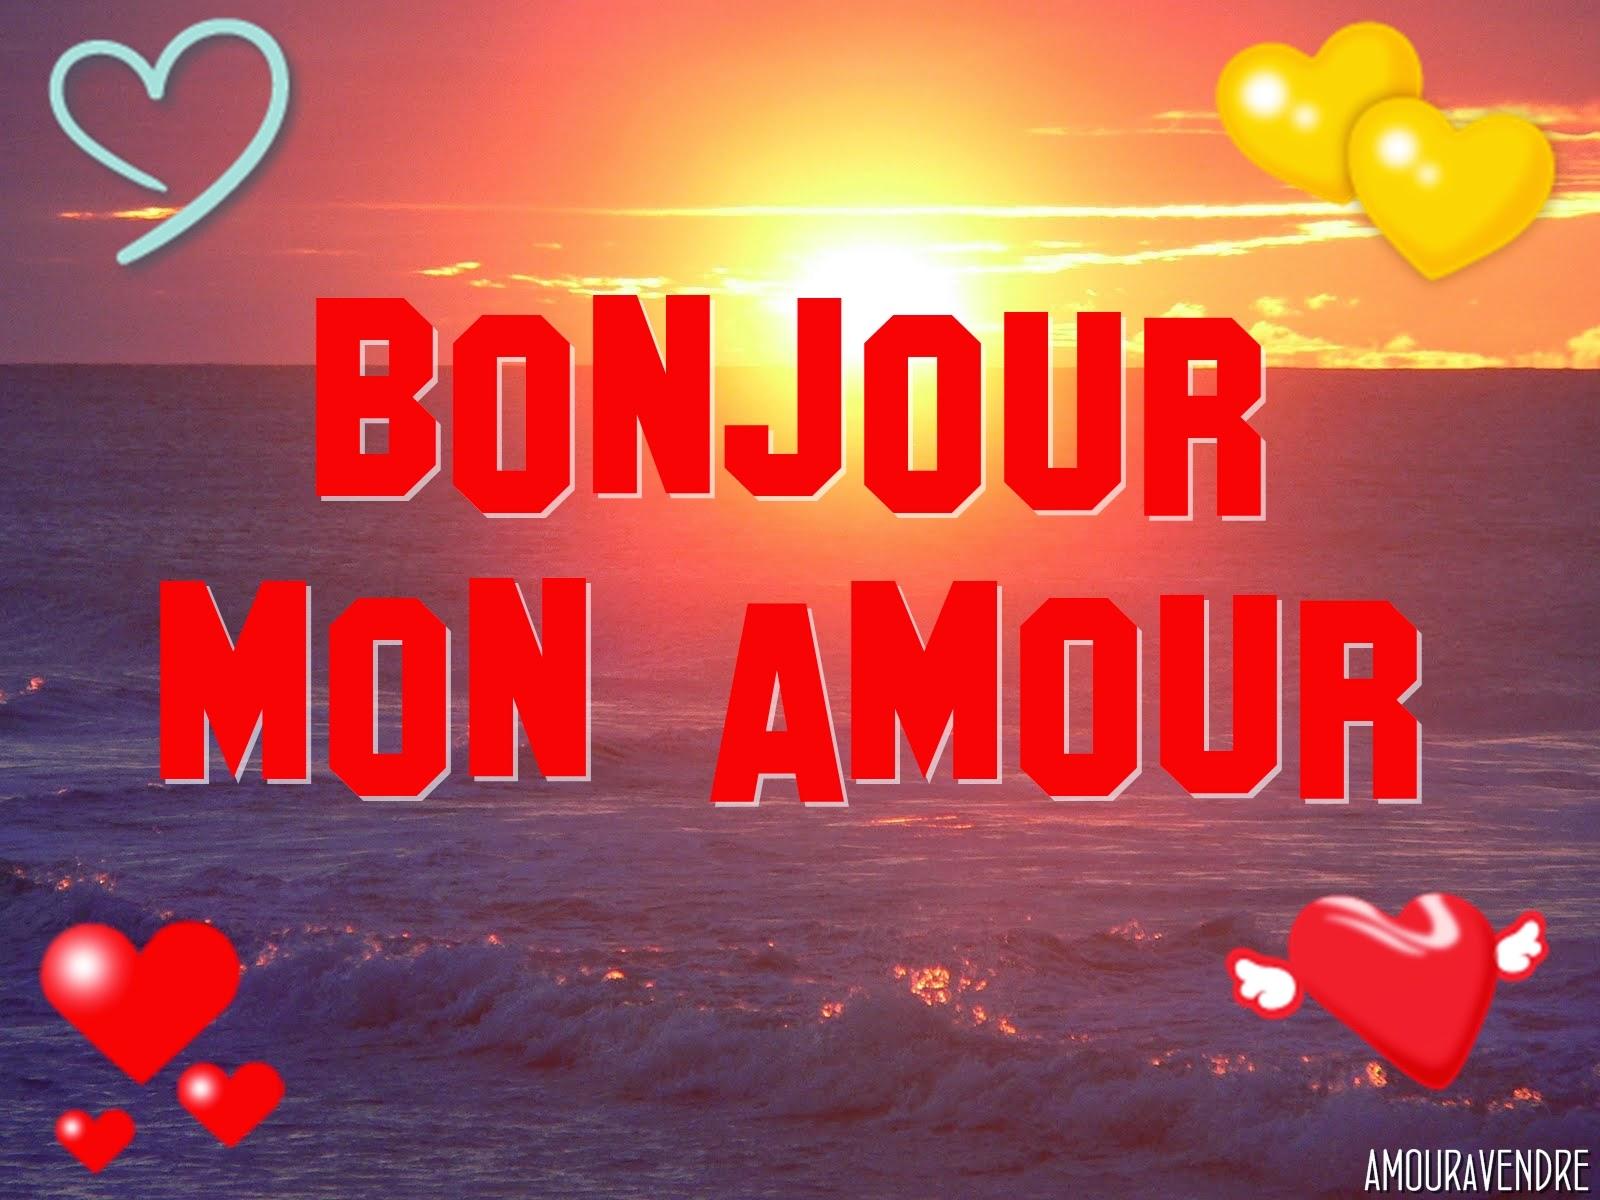 sms d 39 amour 2018 sms d 39 amour message message d 39 amour pour dire bonjour. Black Bedroom Furniture Sets. Home Design Ideas